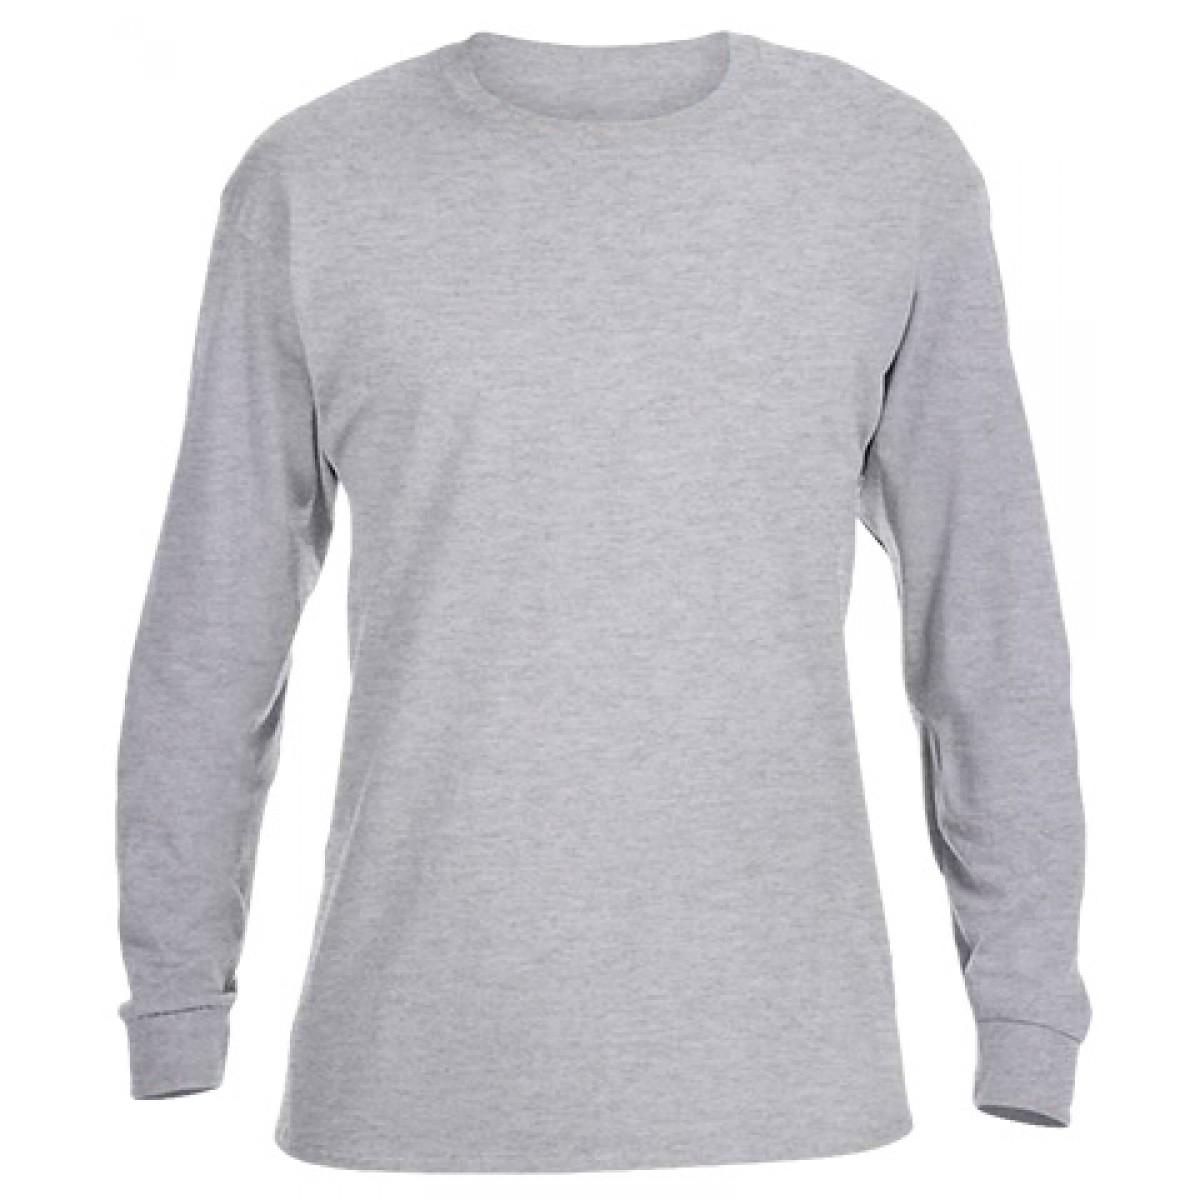 Ultra Cotton Long-Sleeve T-Shirt-Ash Gray-XL